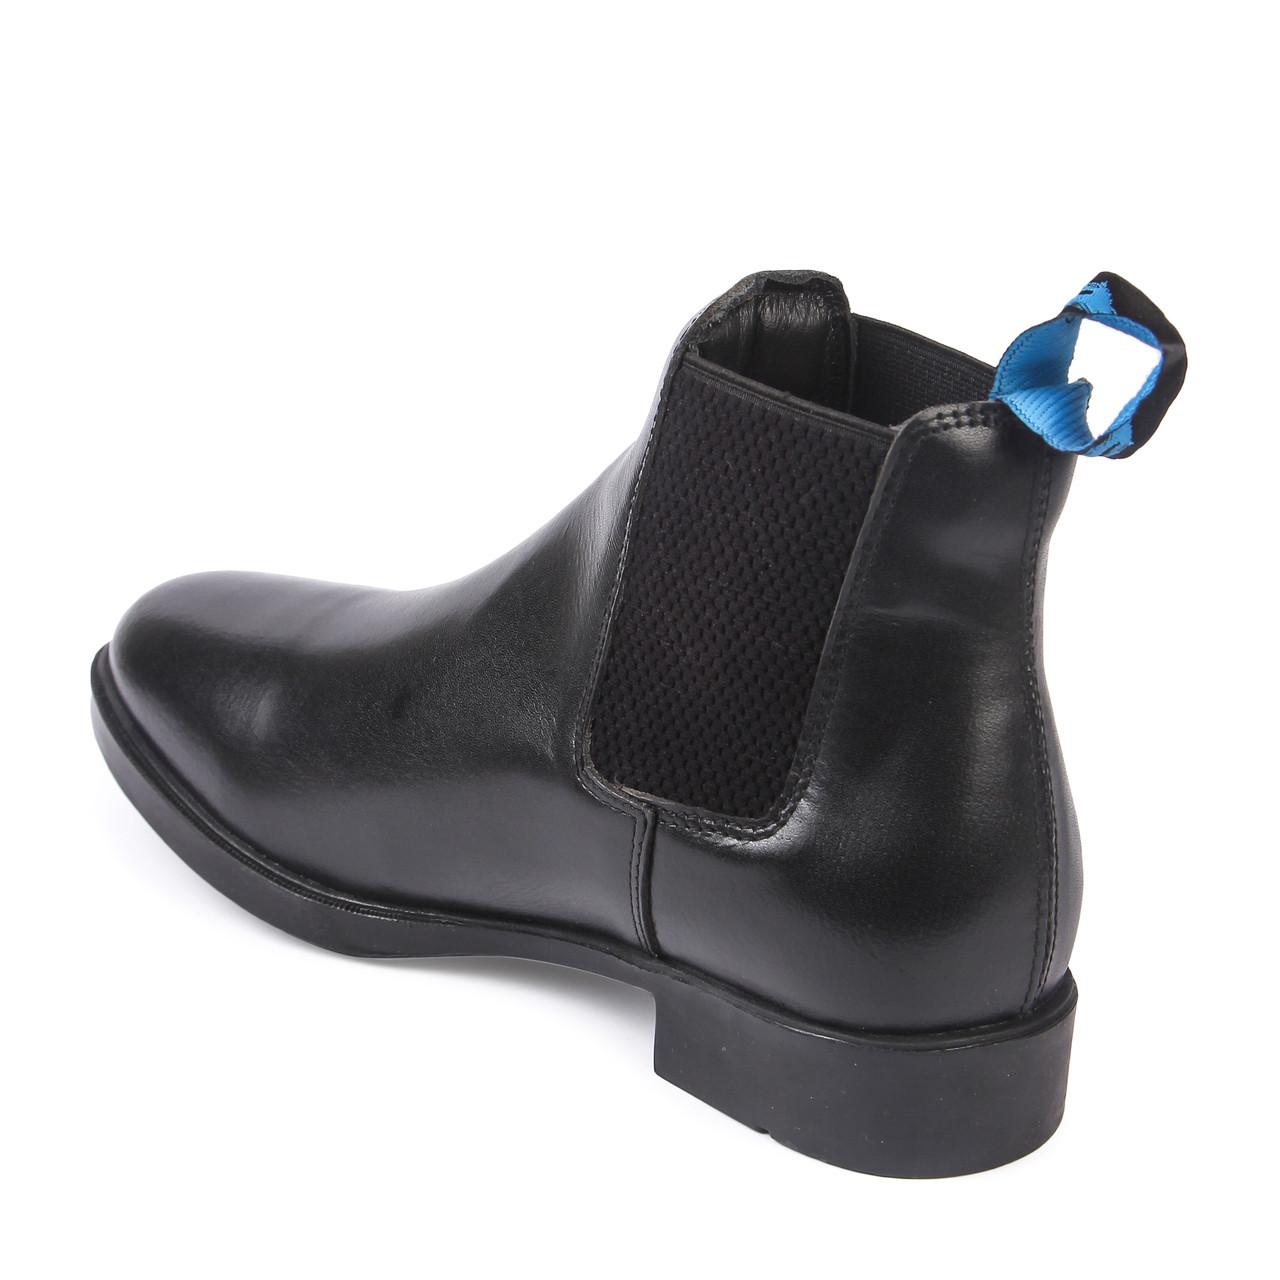 Pull On Paddock Black Jodhpurs Boots